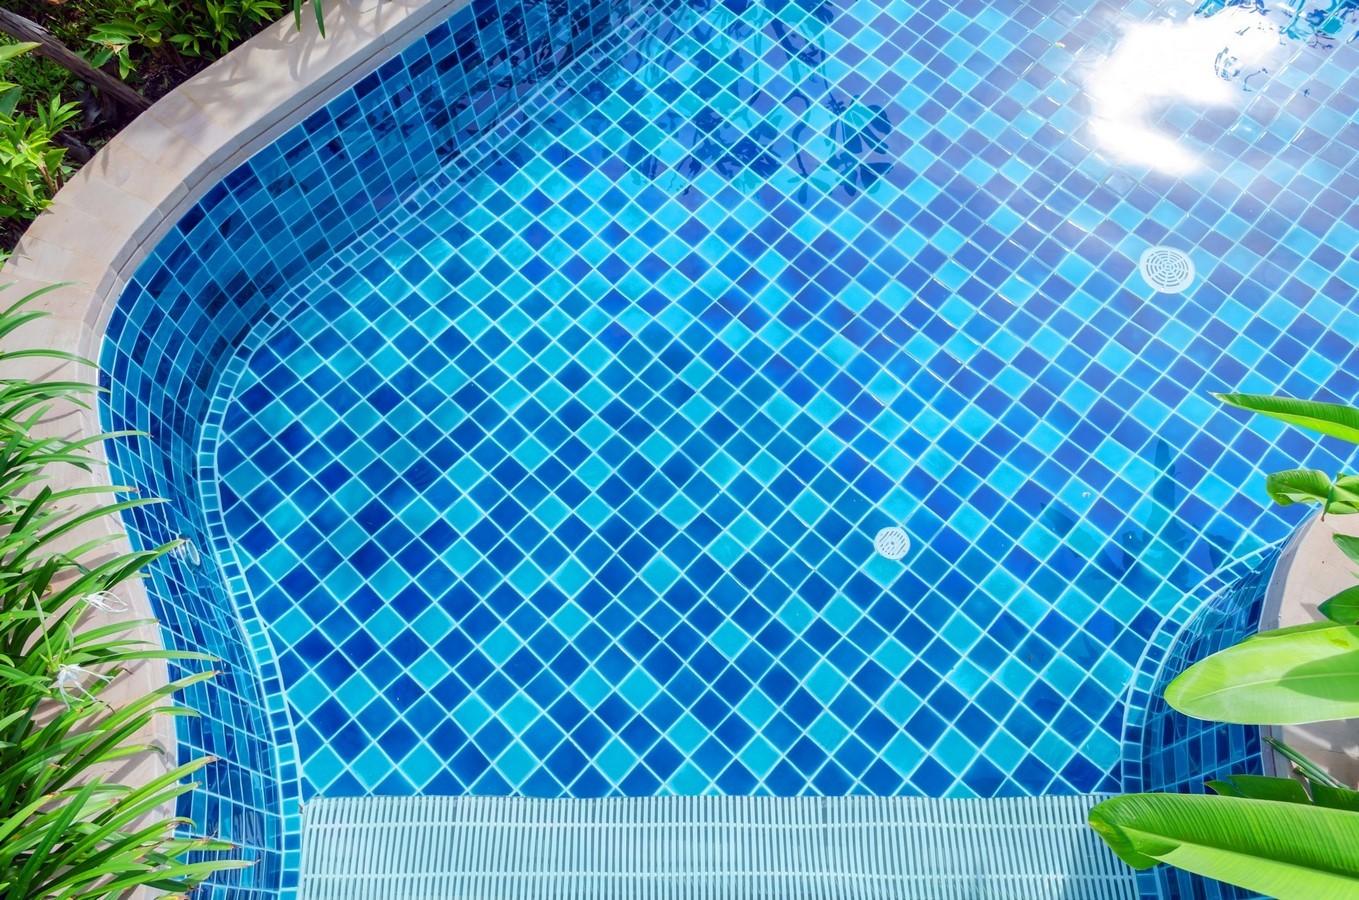 25 flooring patterns for Swimming Pools - Sheet5